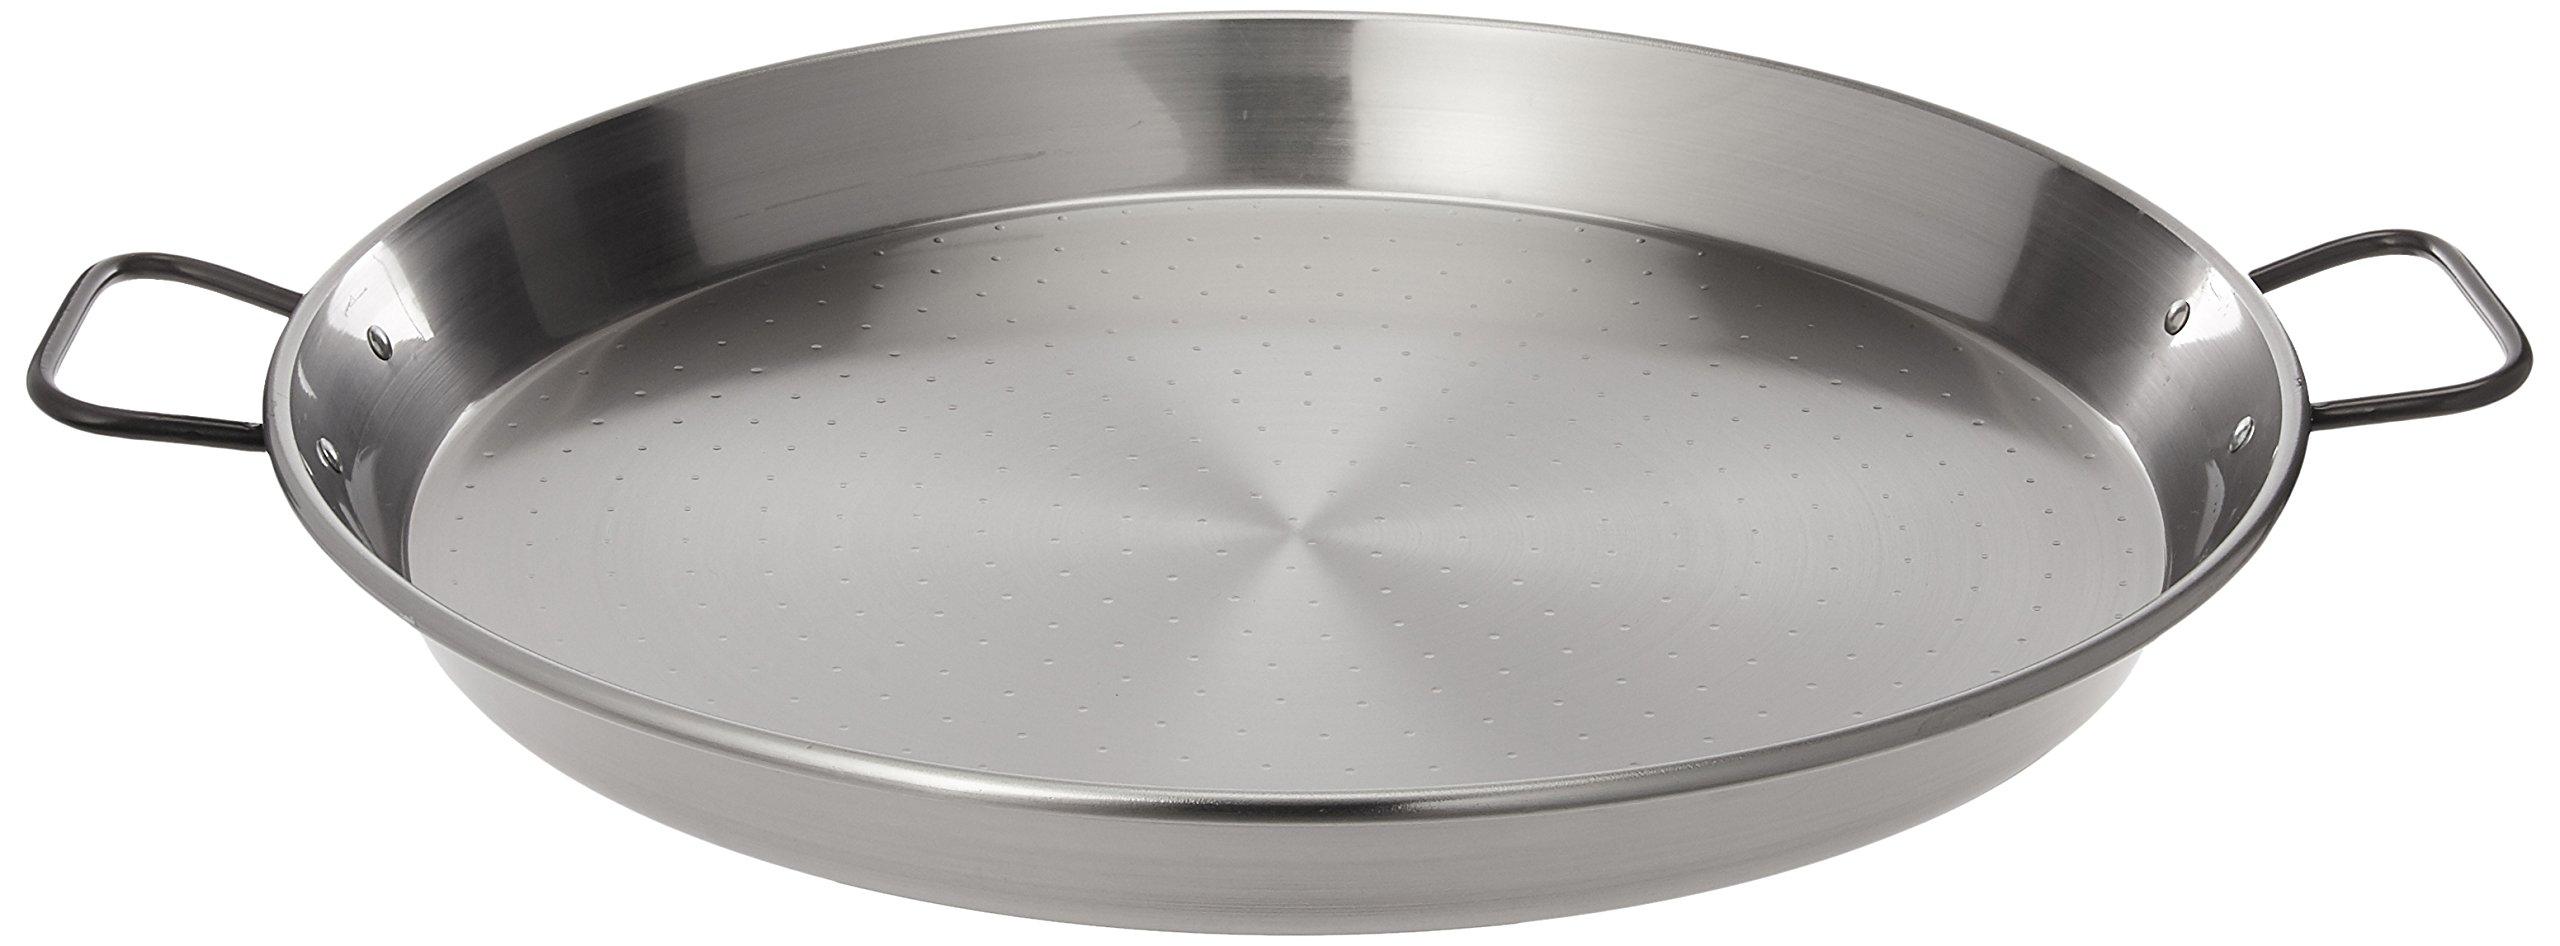 La Paella 18'' Pata Negra Restaurant Grade Paella Pan, Large, Silver